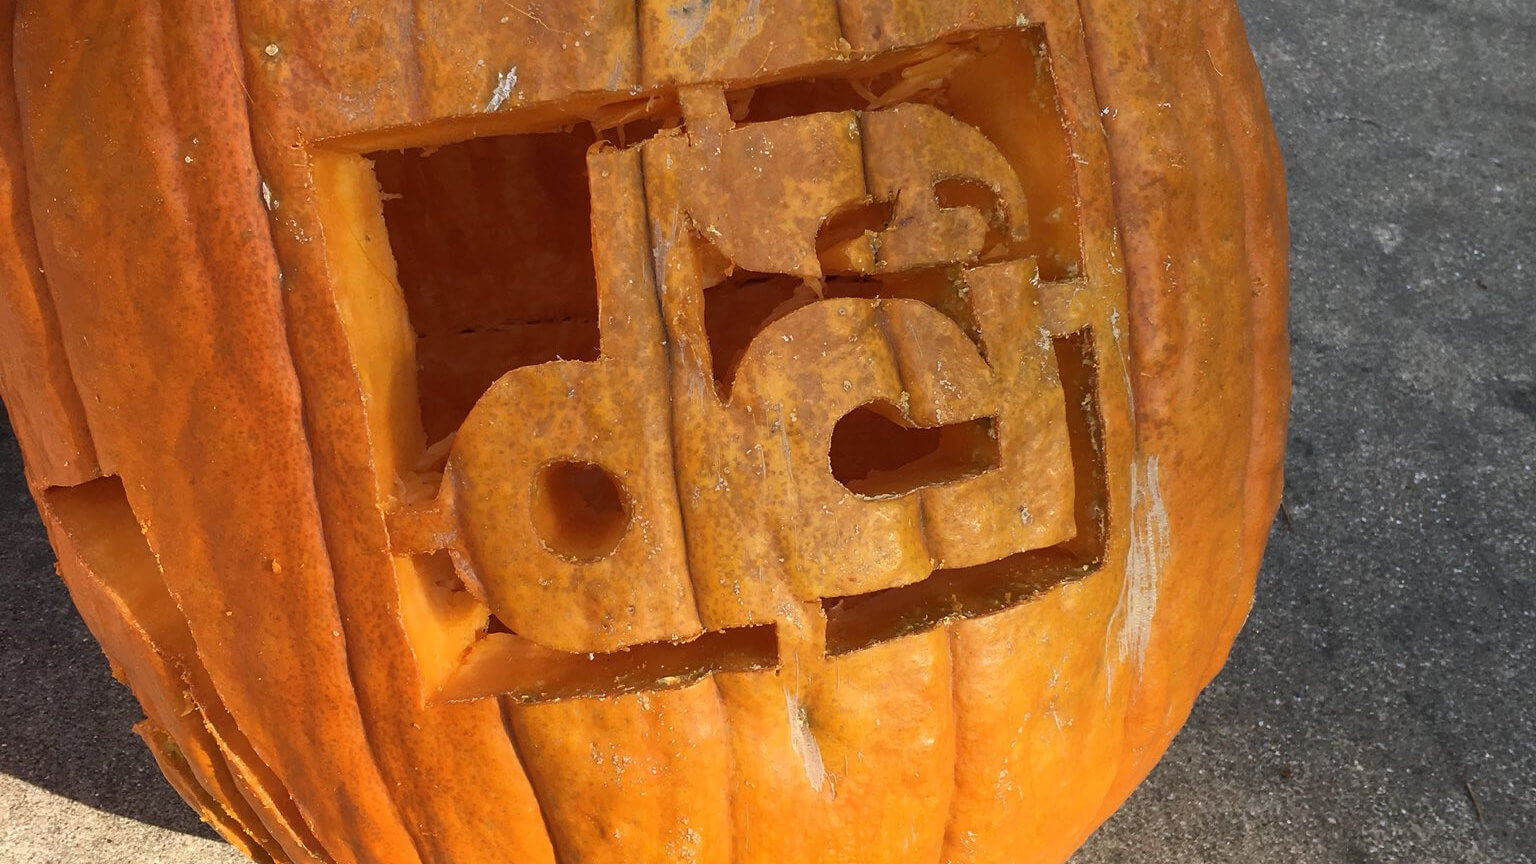 Drum corps pumpkins